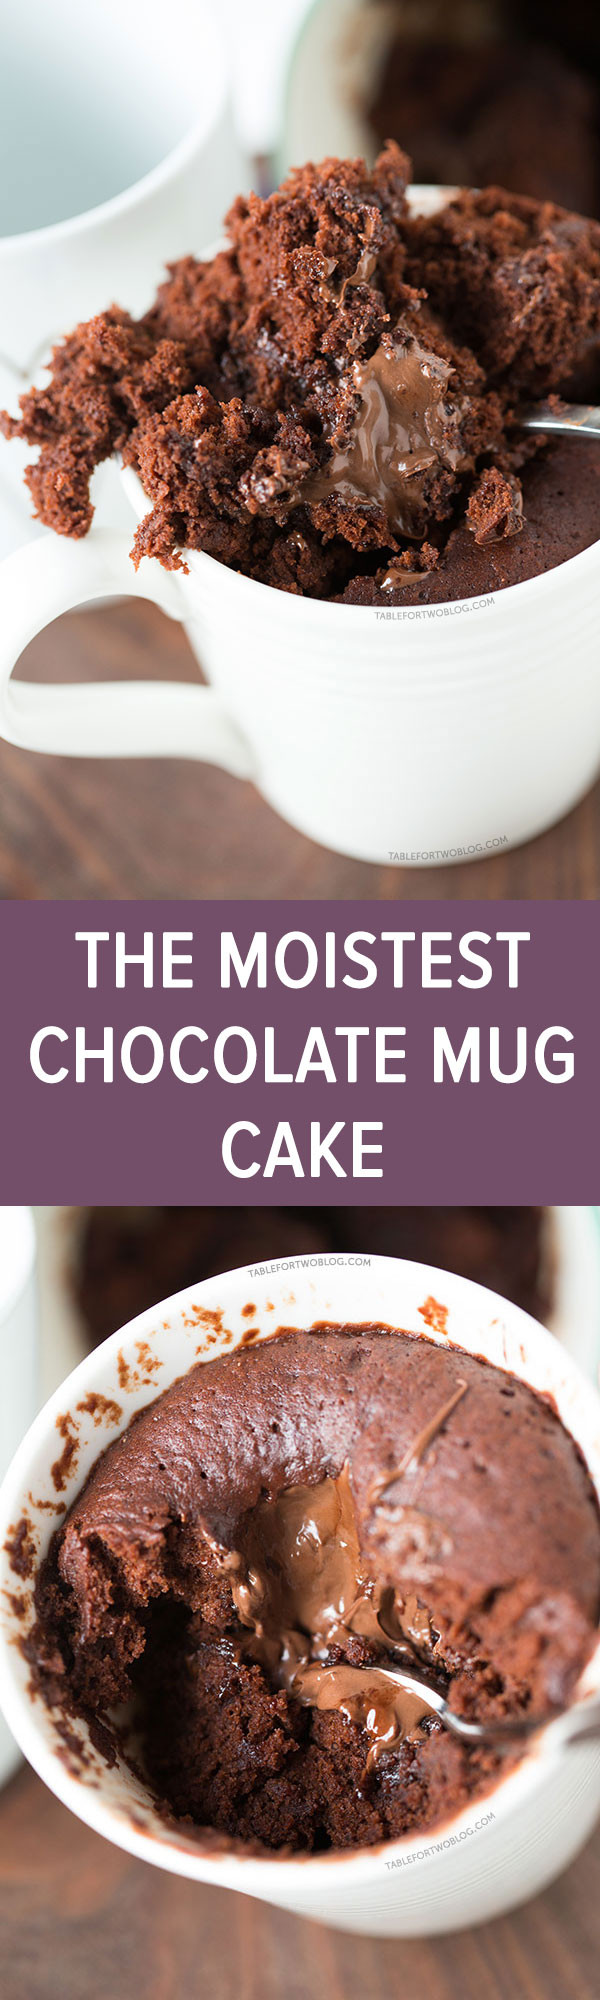 Cake In A Mug Recipe  The Moistest Chocolate Mug Cake For e or Two No Egg